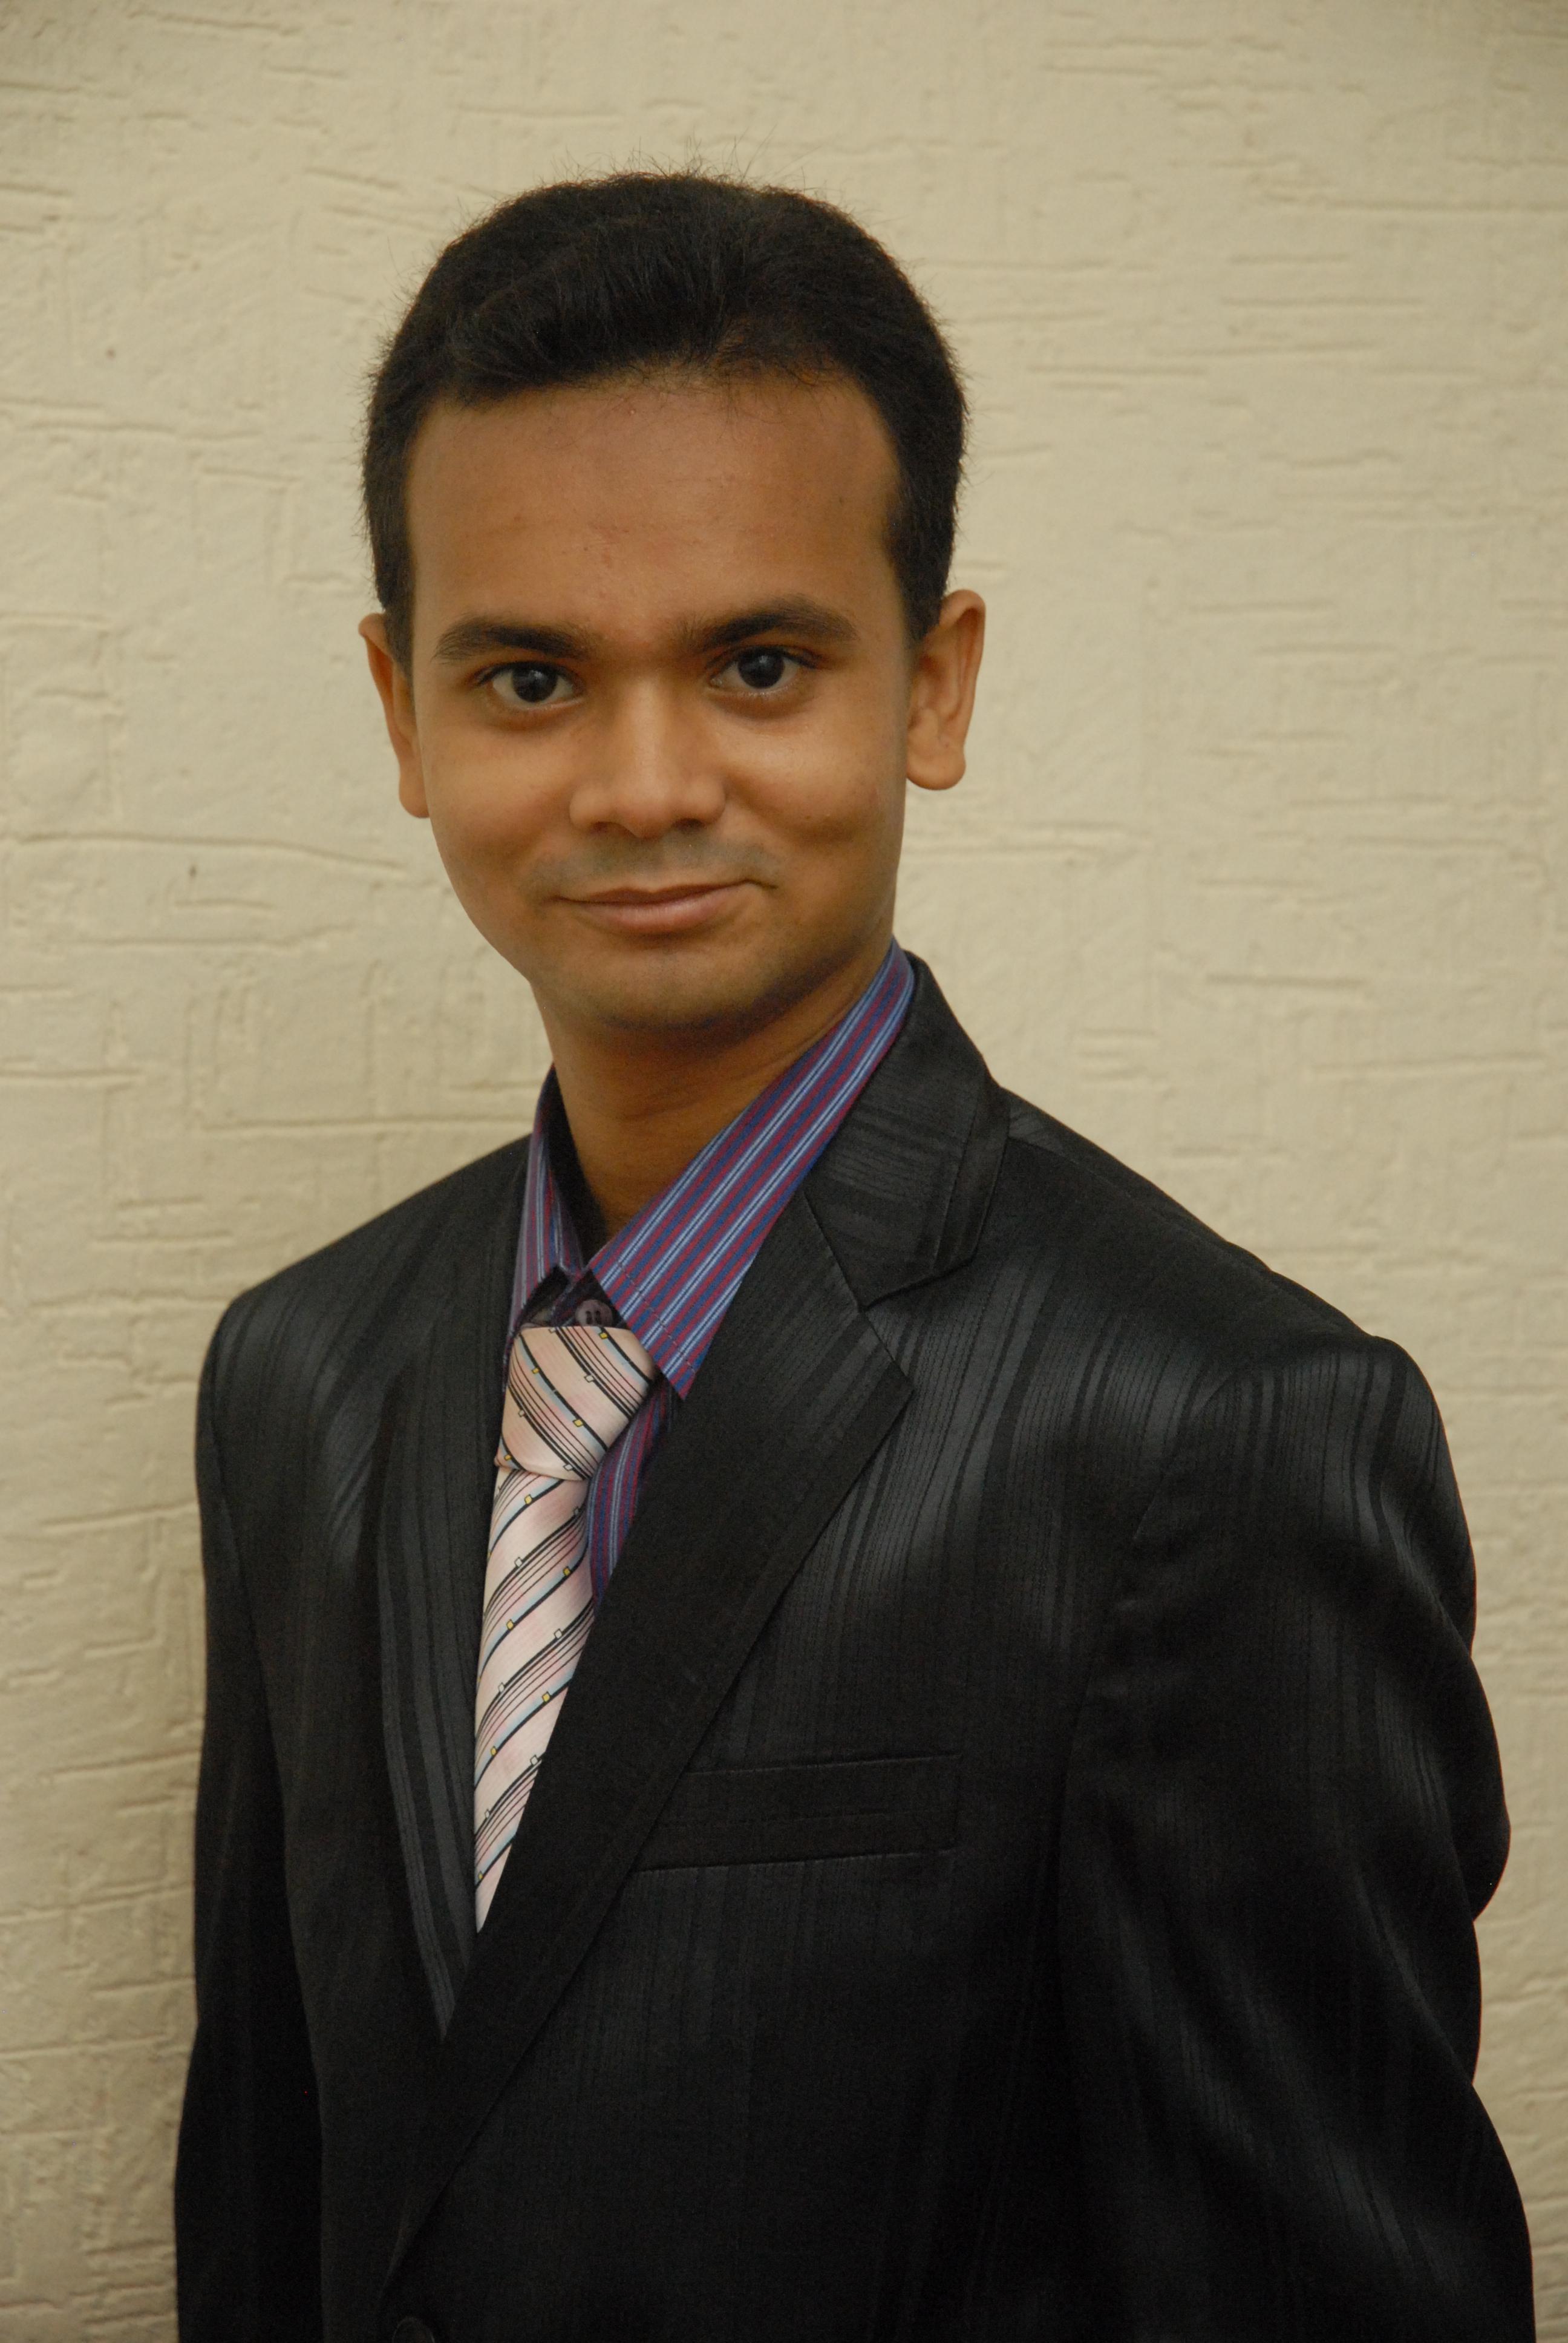 Mubashir Ahmed Facebook Mubashir Uddin Ahmed